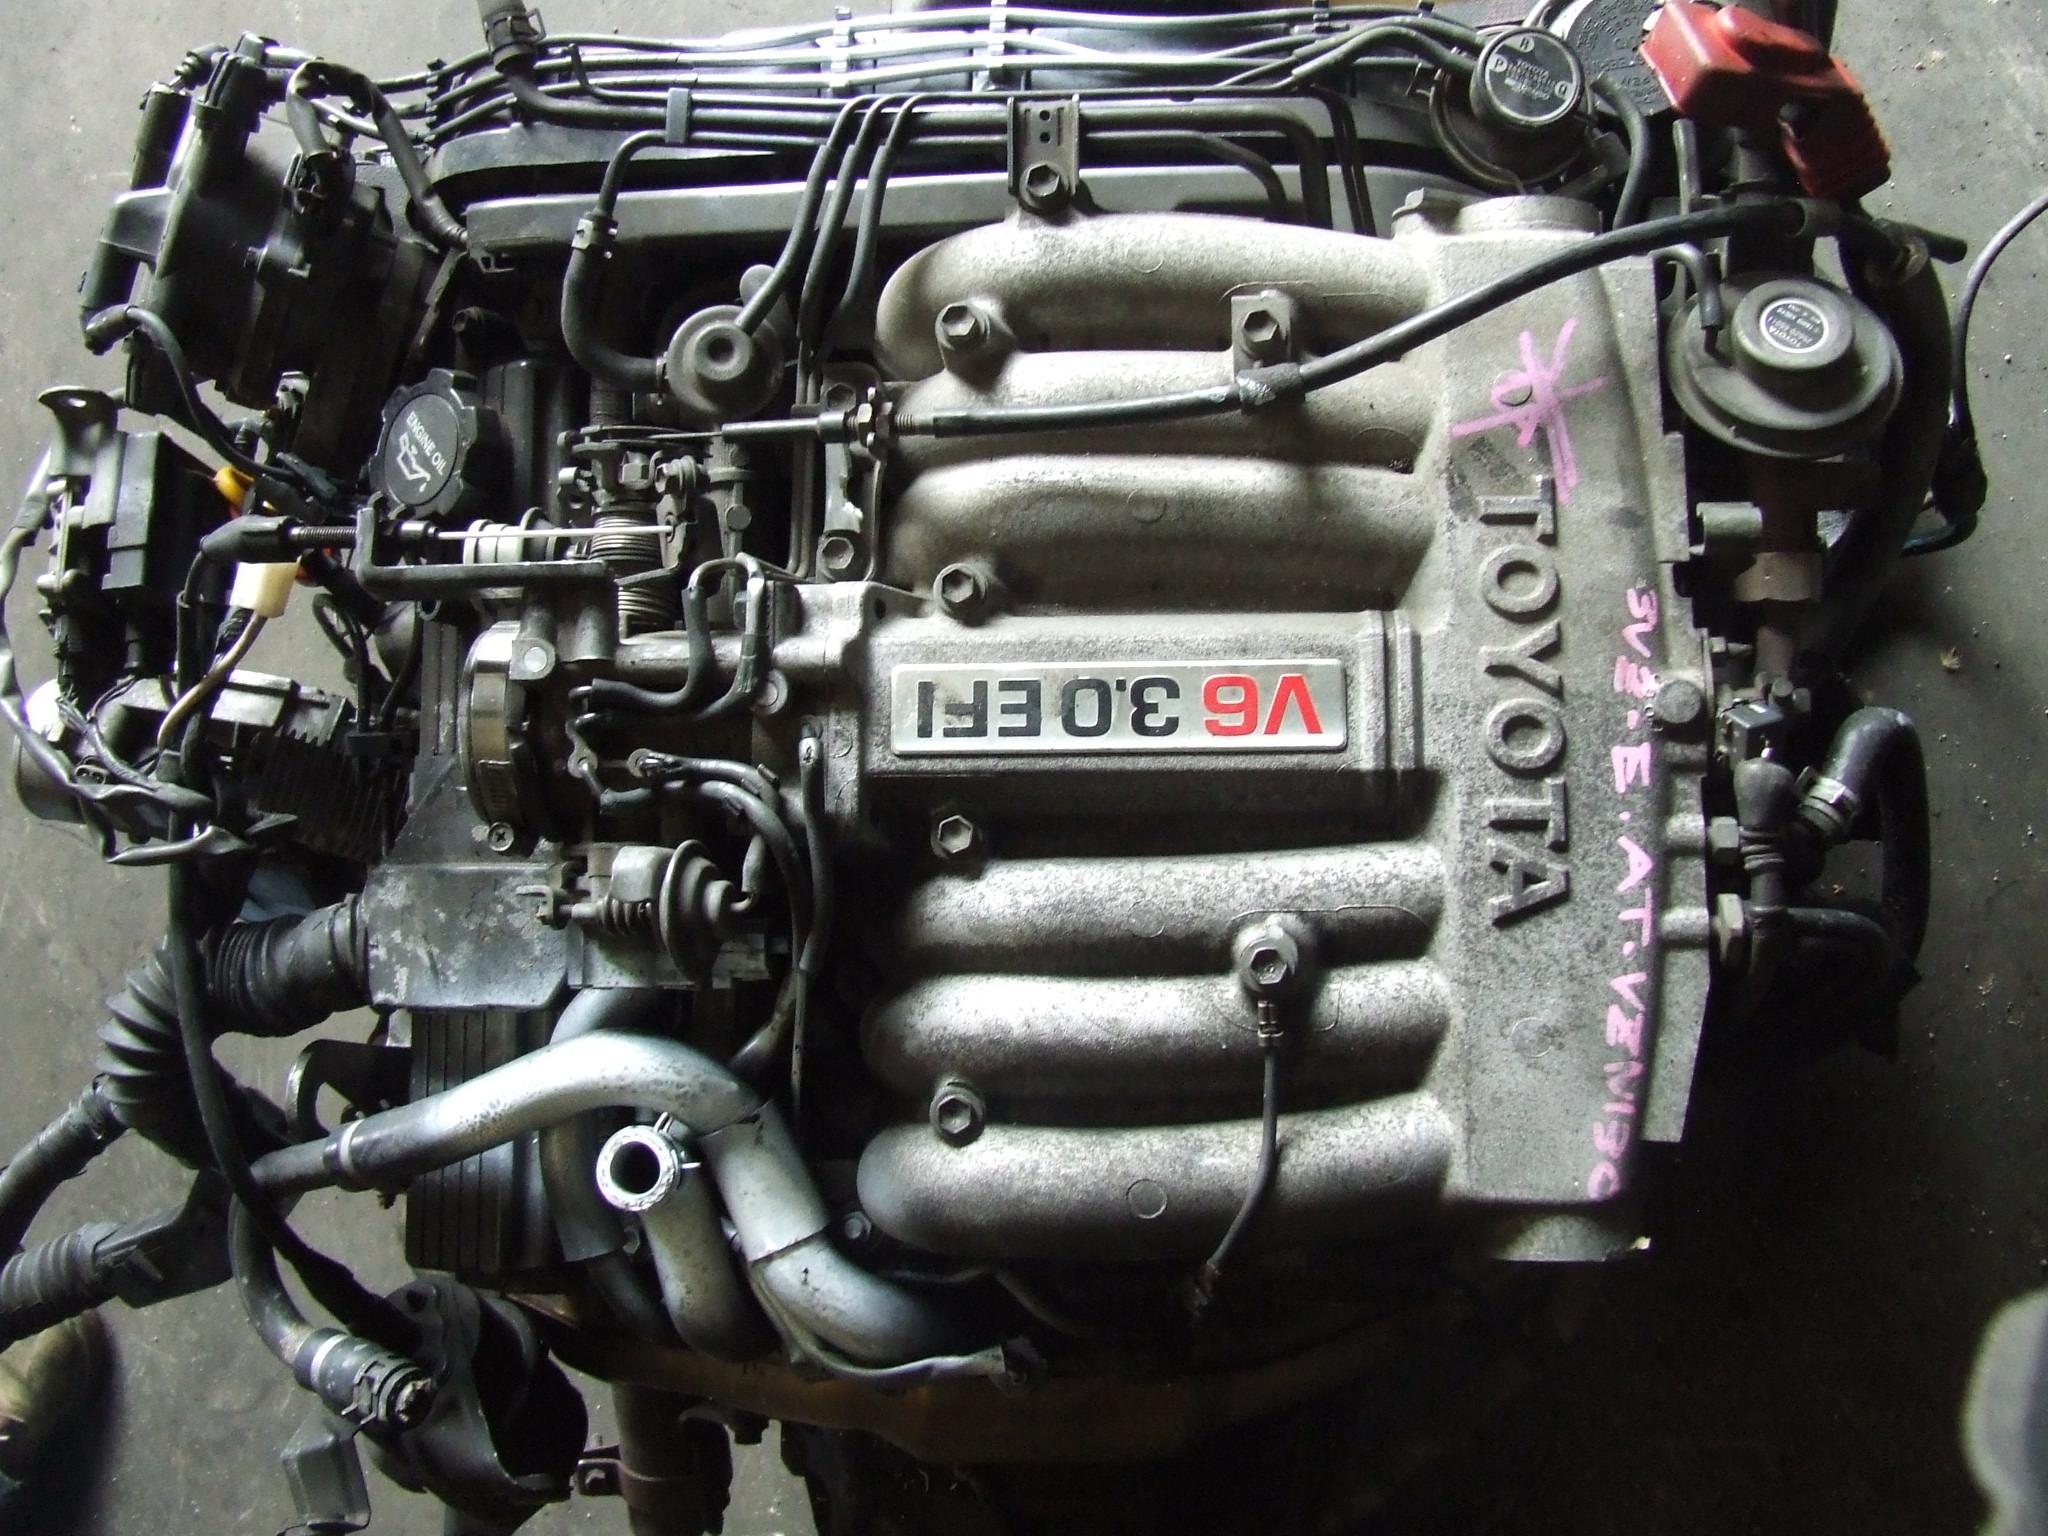 1994 Toyota Pickup V6 4x4 Engine Diagram -Arctic Cat Jag Wiring Diagram 86  | Begeboy Wiring Diagram SourceBegeboy Wiring Diagram Source